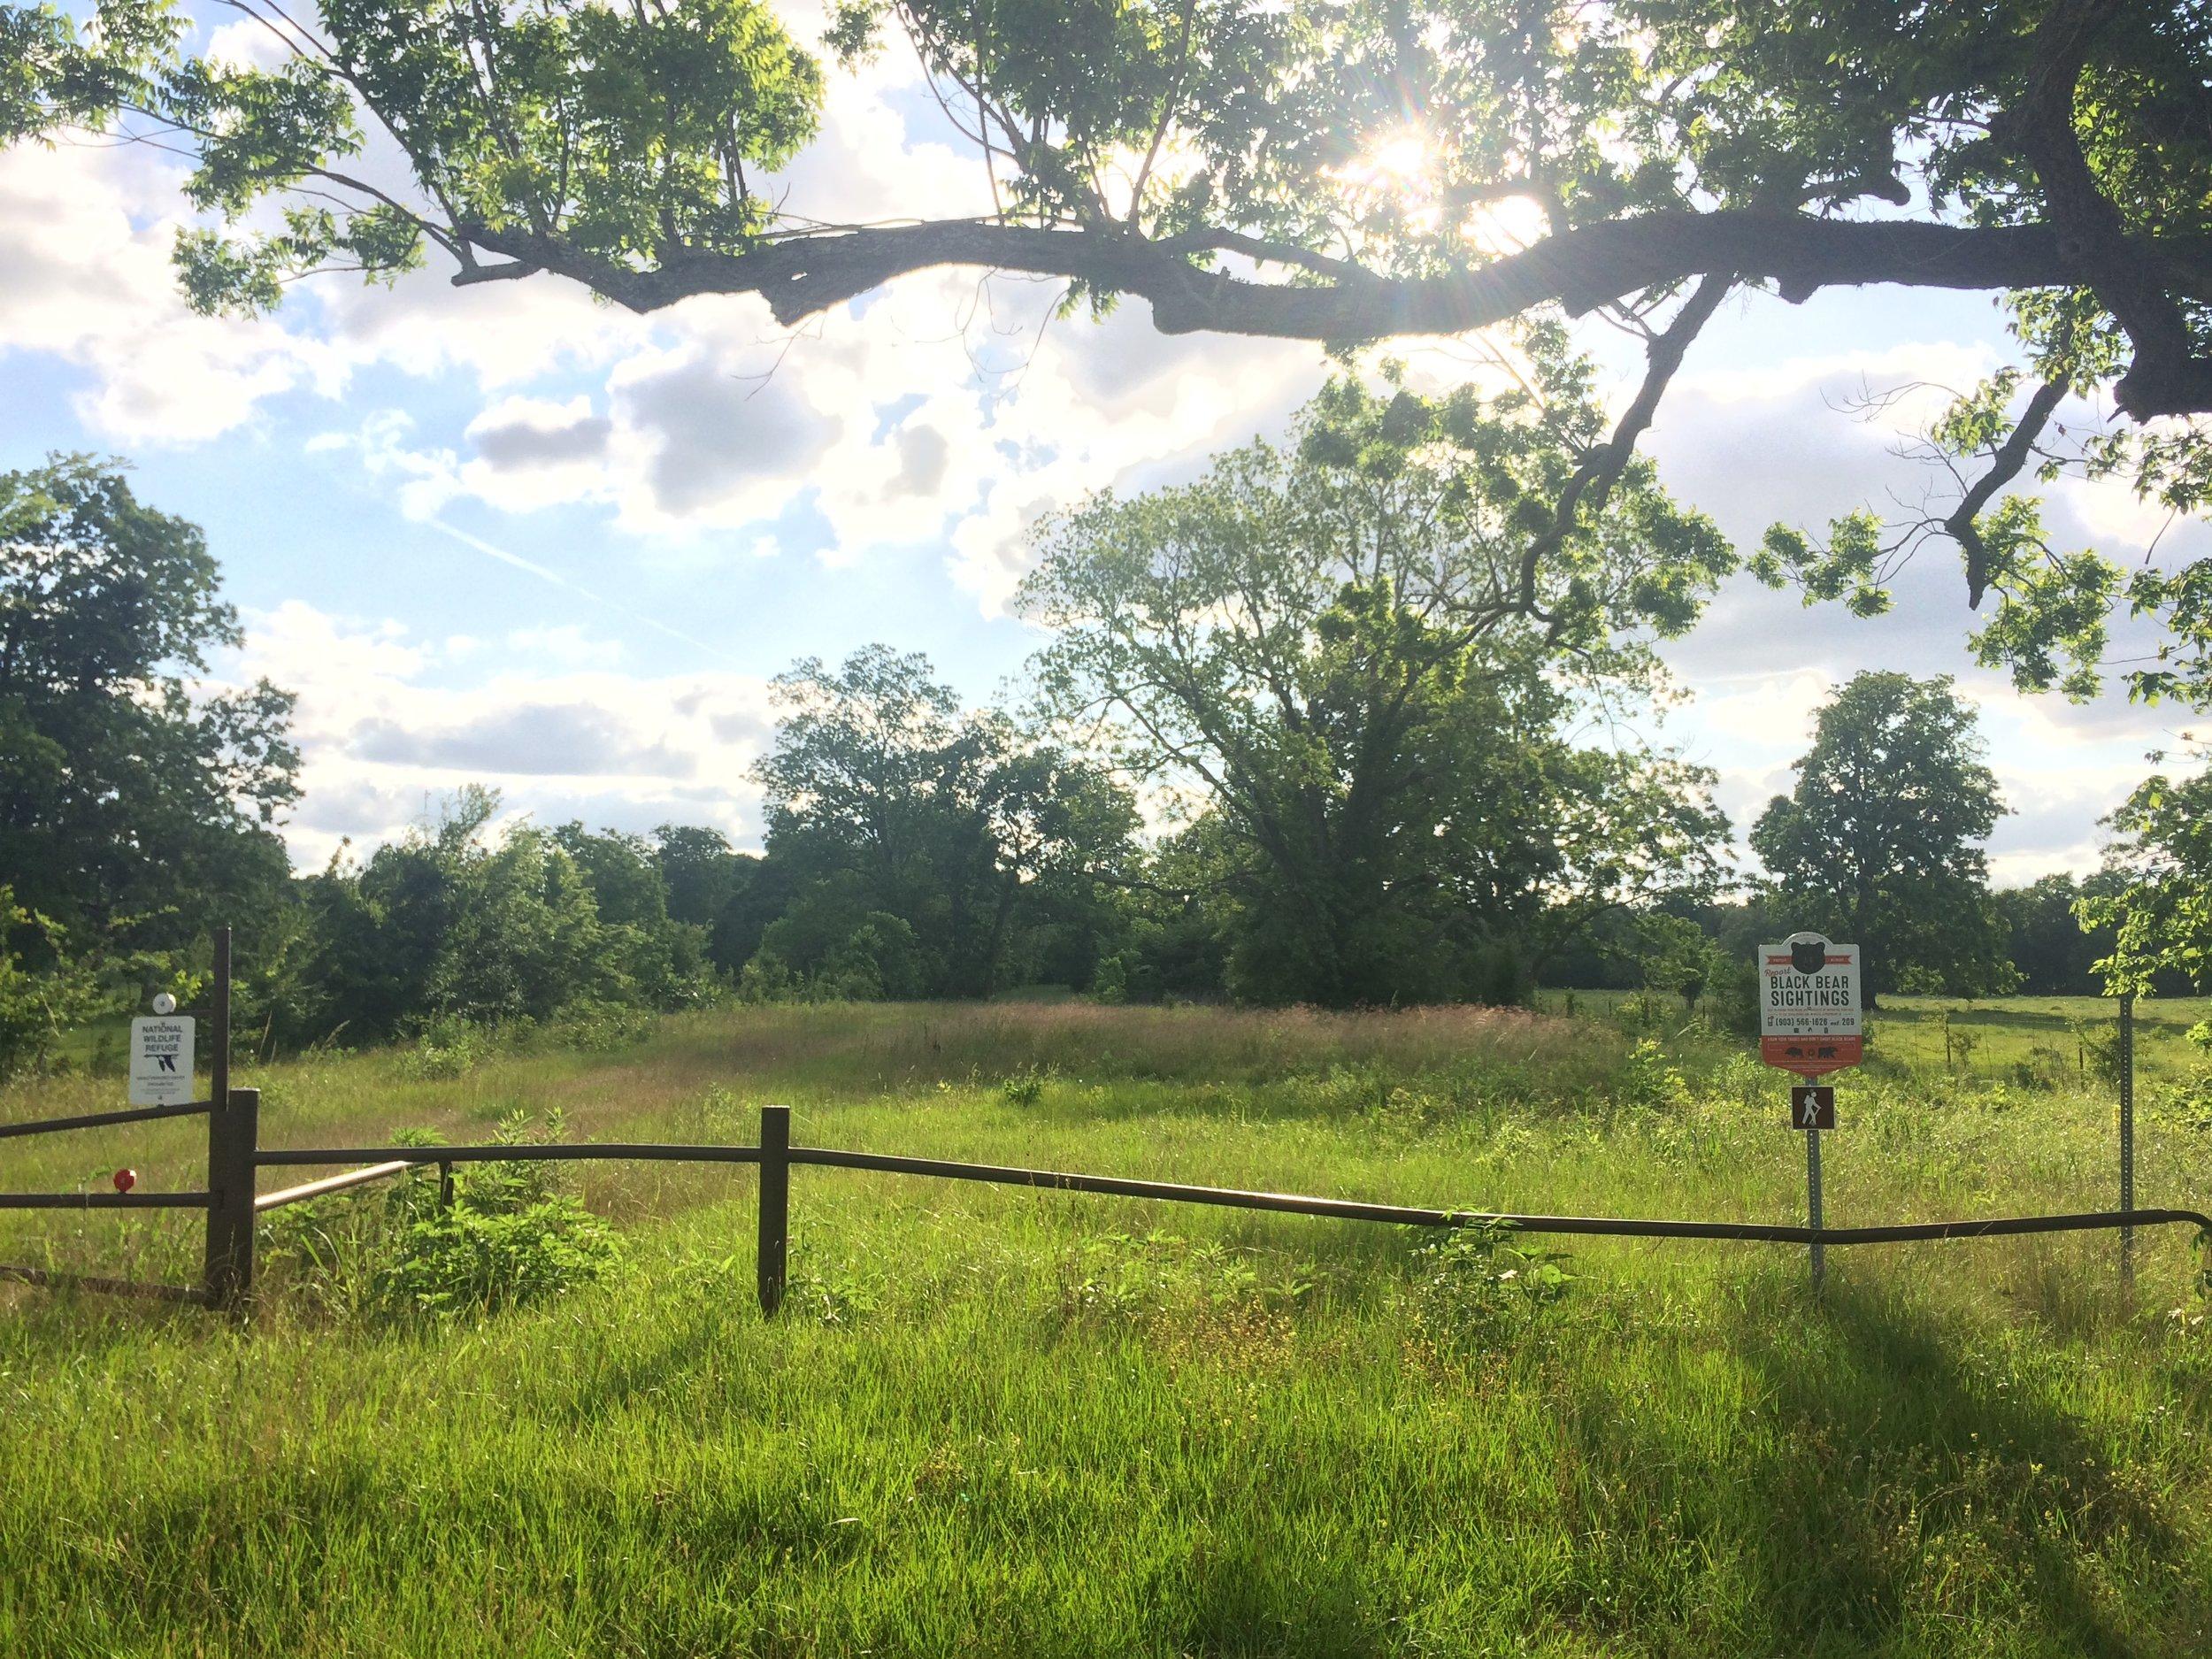 Summer 2017 at National Wildlife Refuge near Sam Houston Regional Library on the Trinity